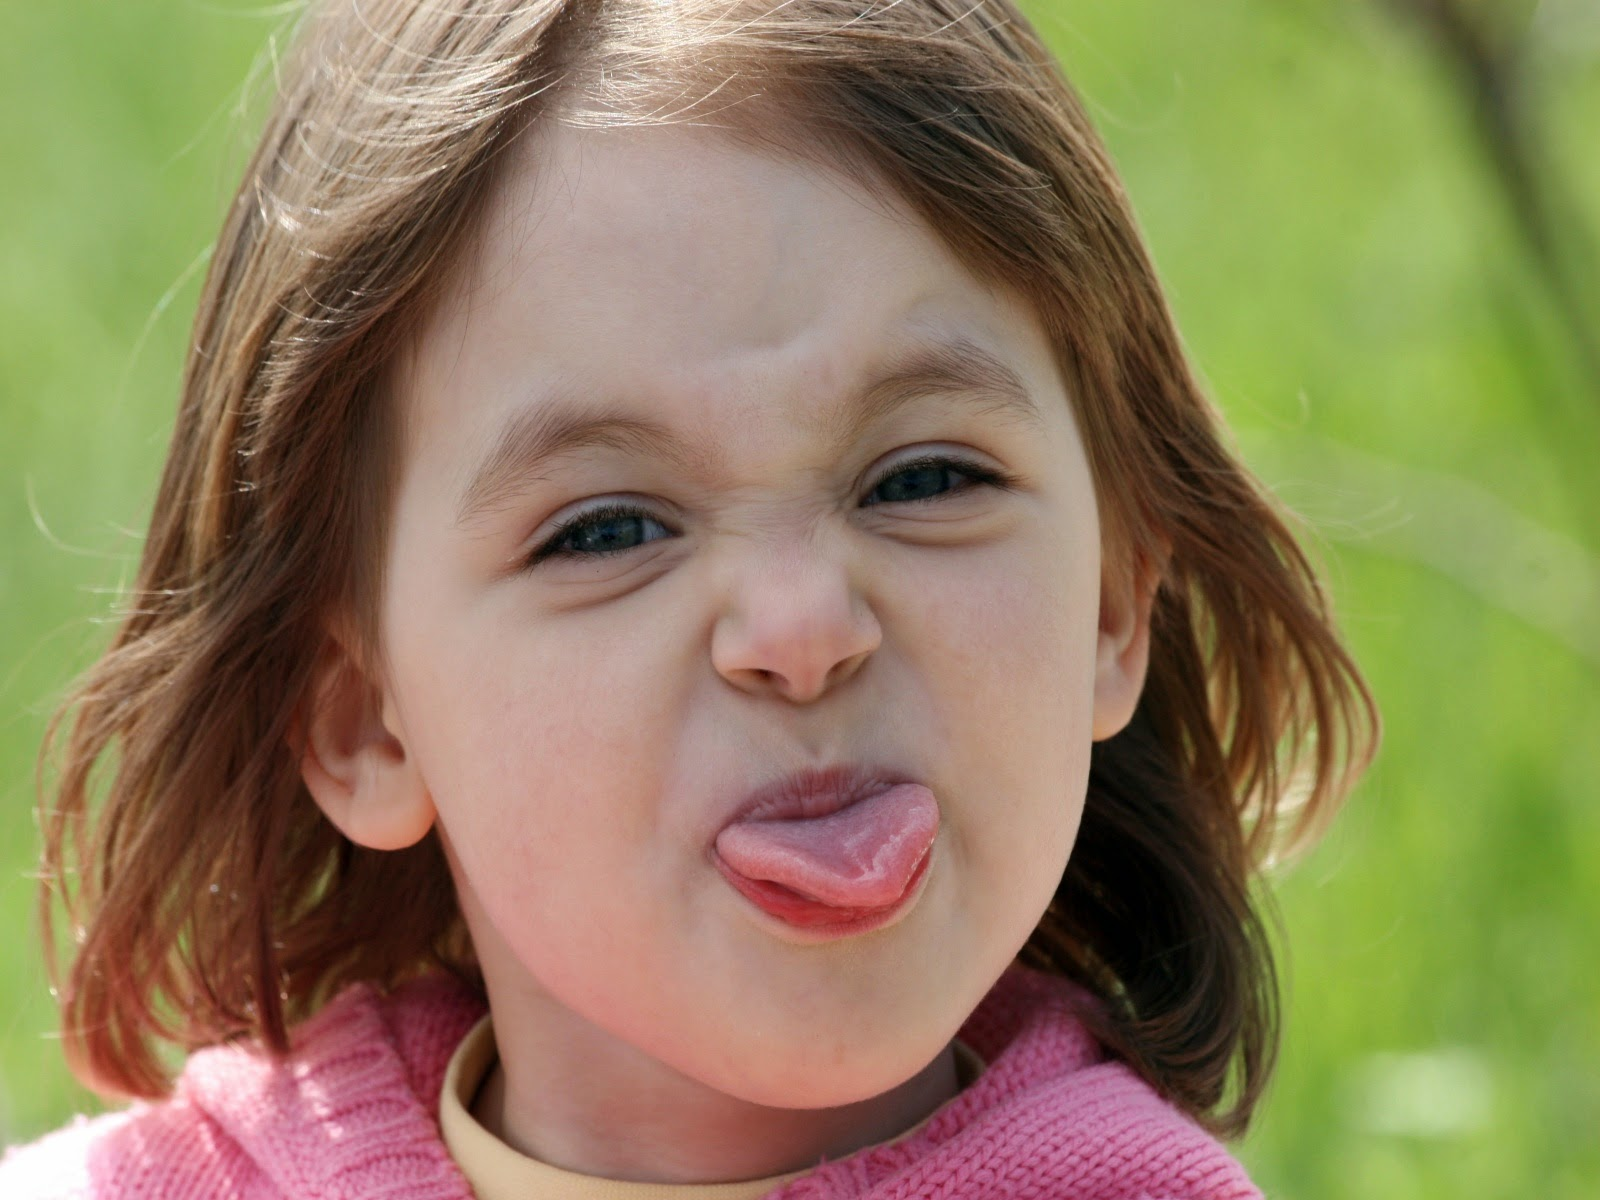 Foto ekspresi lucu bayi cantik menggemaskan